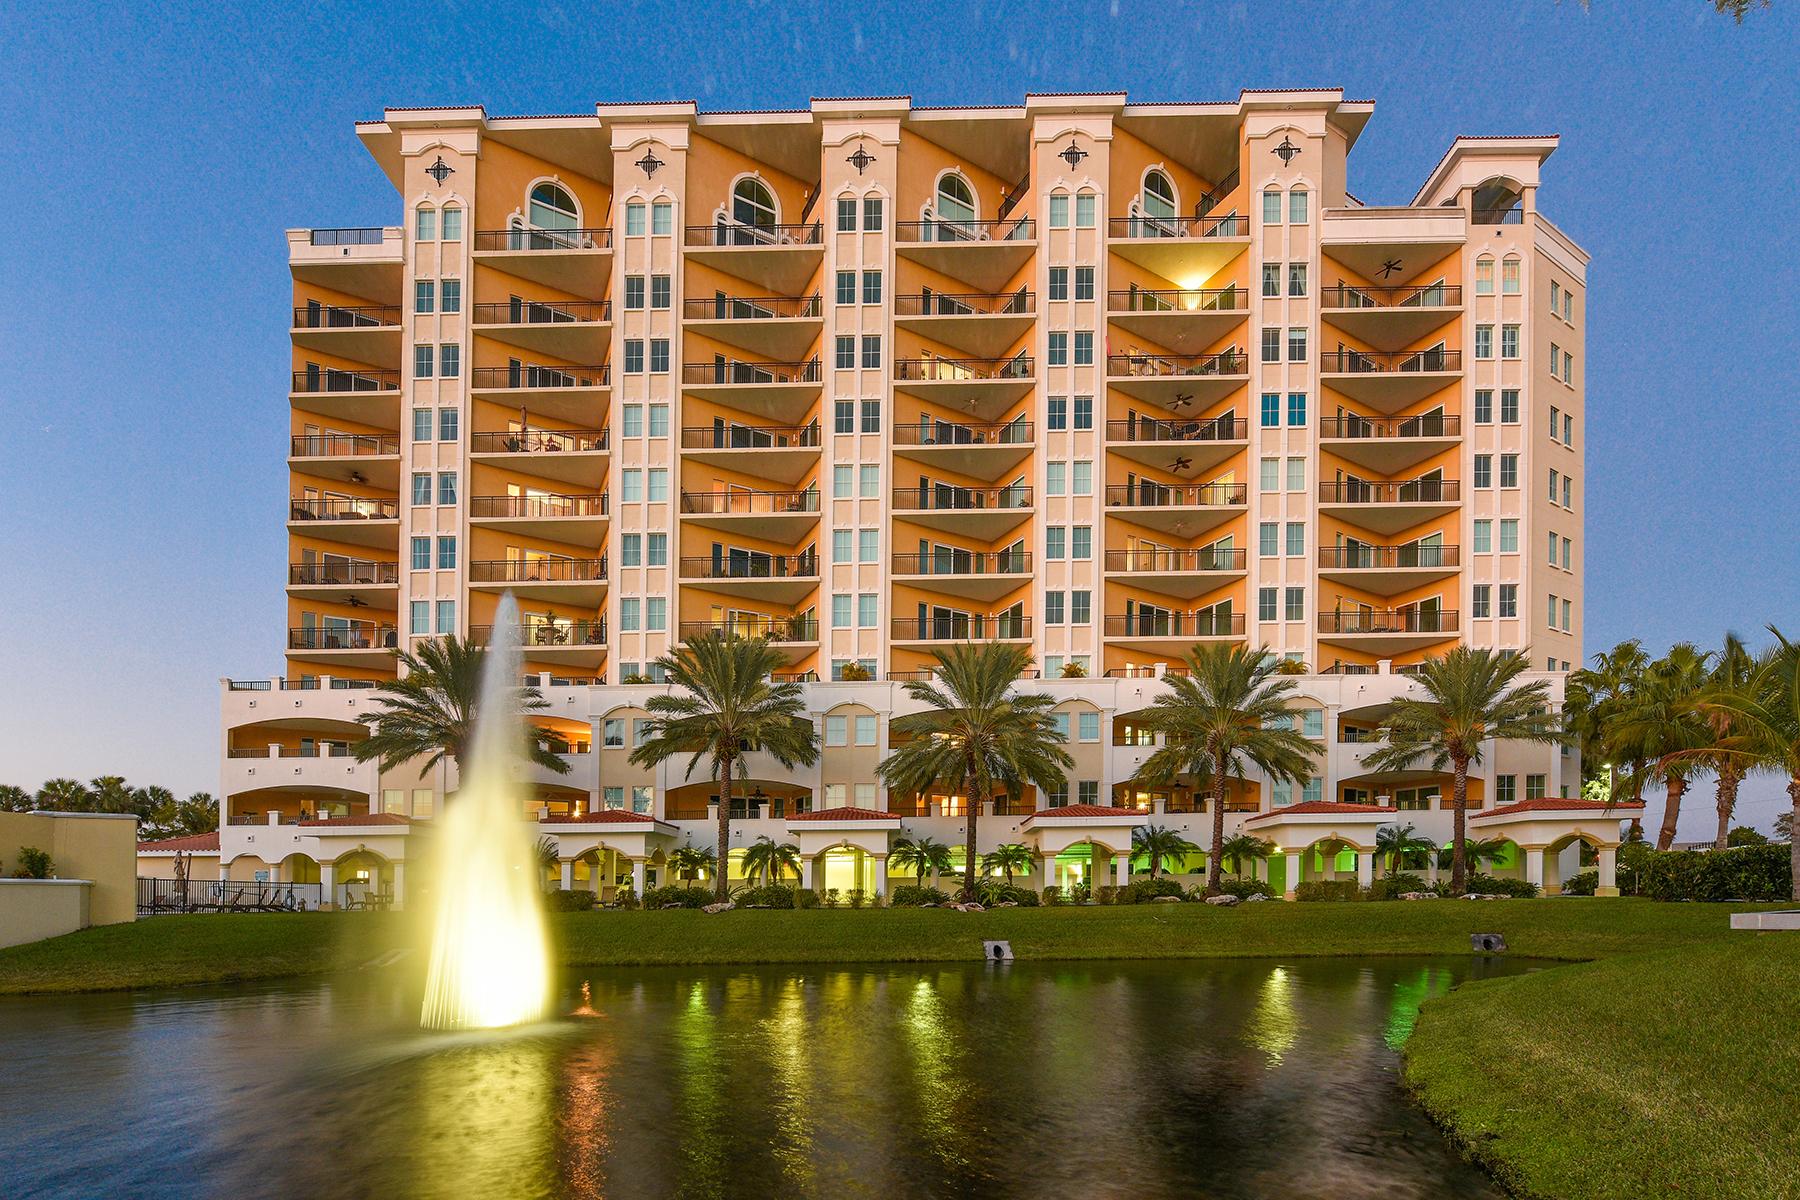 Condomínio para Venda às THE PALMS AT RIVIERA DUNES 501 Haben Blvd 906 Palmetto, Florida, 34221 Estados Unidos